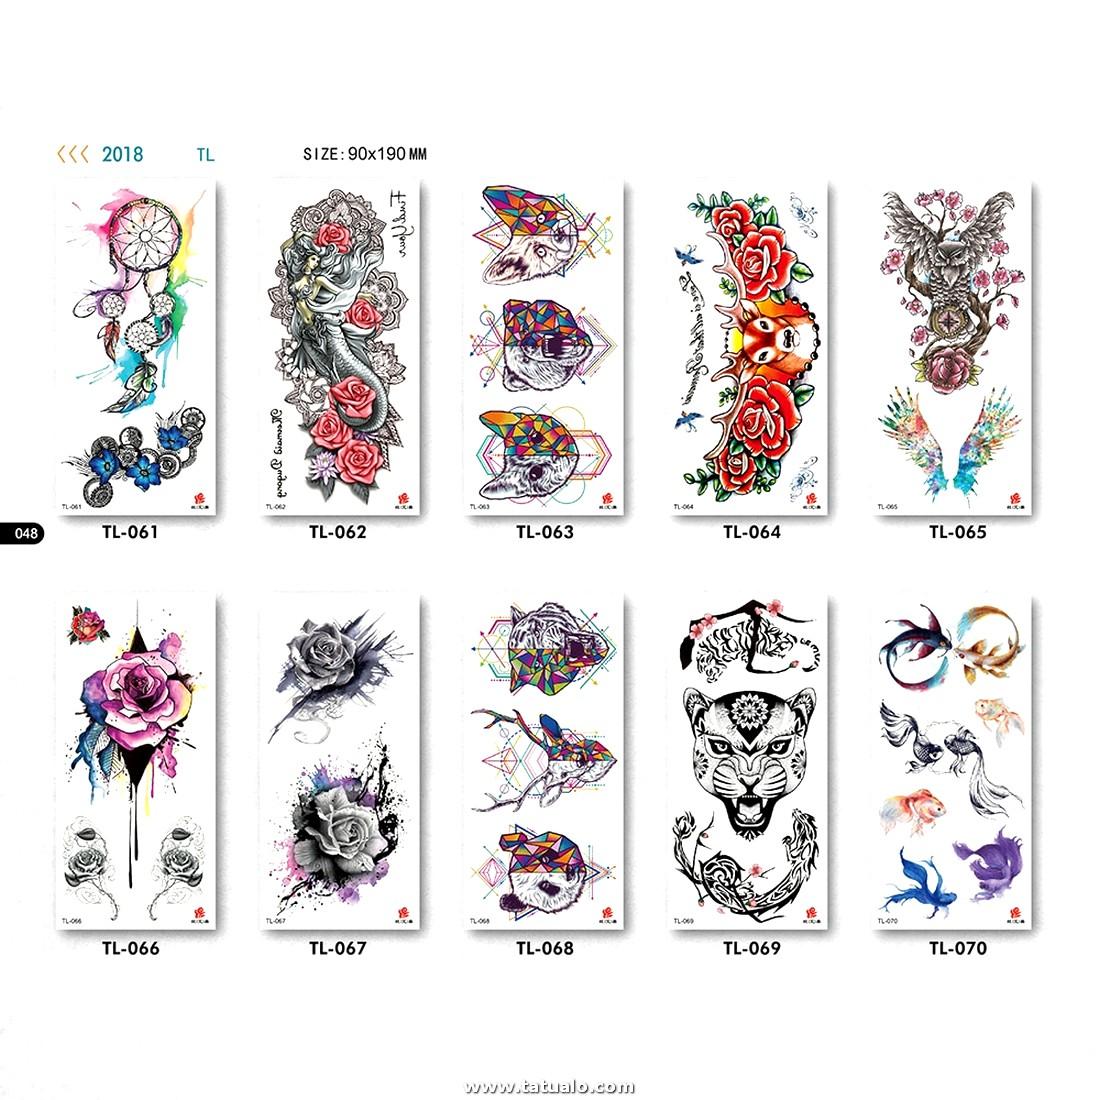 151951 Brazo Falso Tatuaje Mujeres Hombres Belleza Lobo Peces Flor Aguila Leopardo Patrones Cuello Pierna Mano Maquillaje Tatuajes Cara Tatuajes Pegatinas